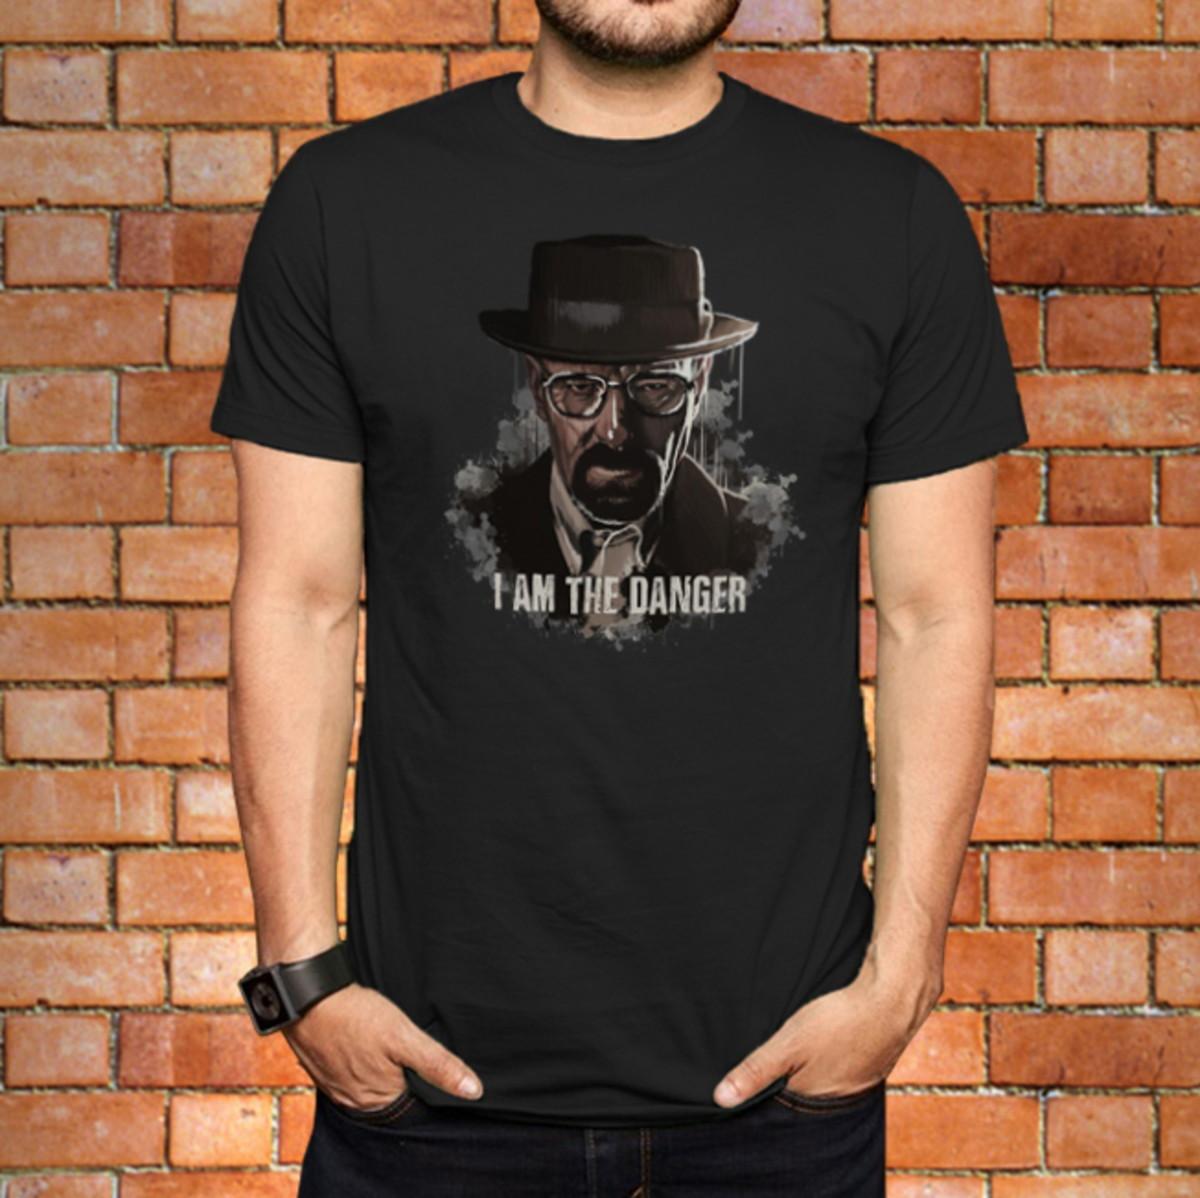 97572d8ec Camiseta Breaking Bad - I Am The Danger no Elo7